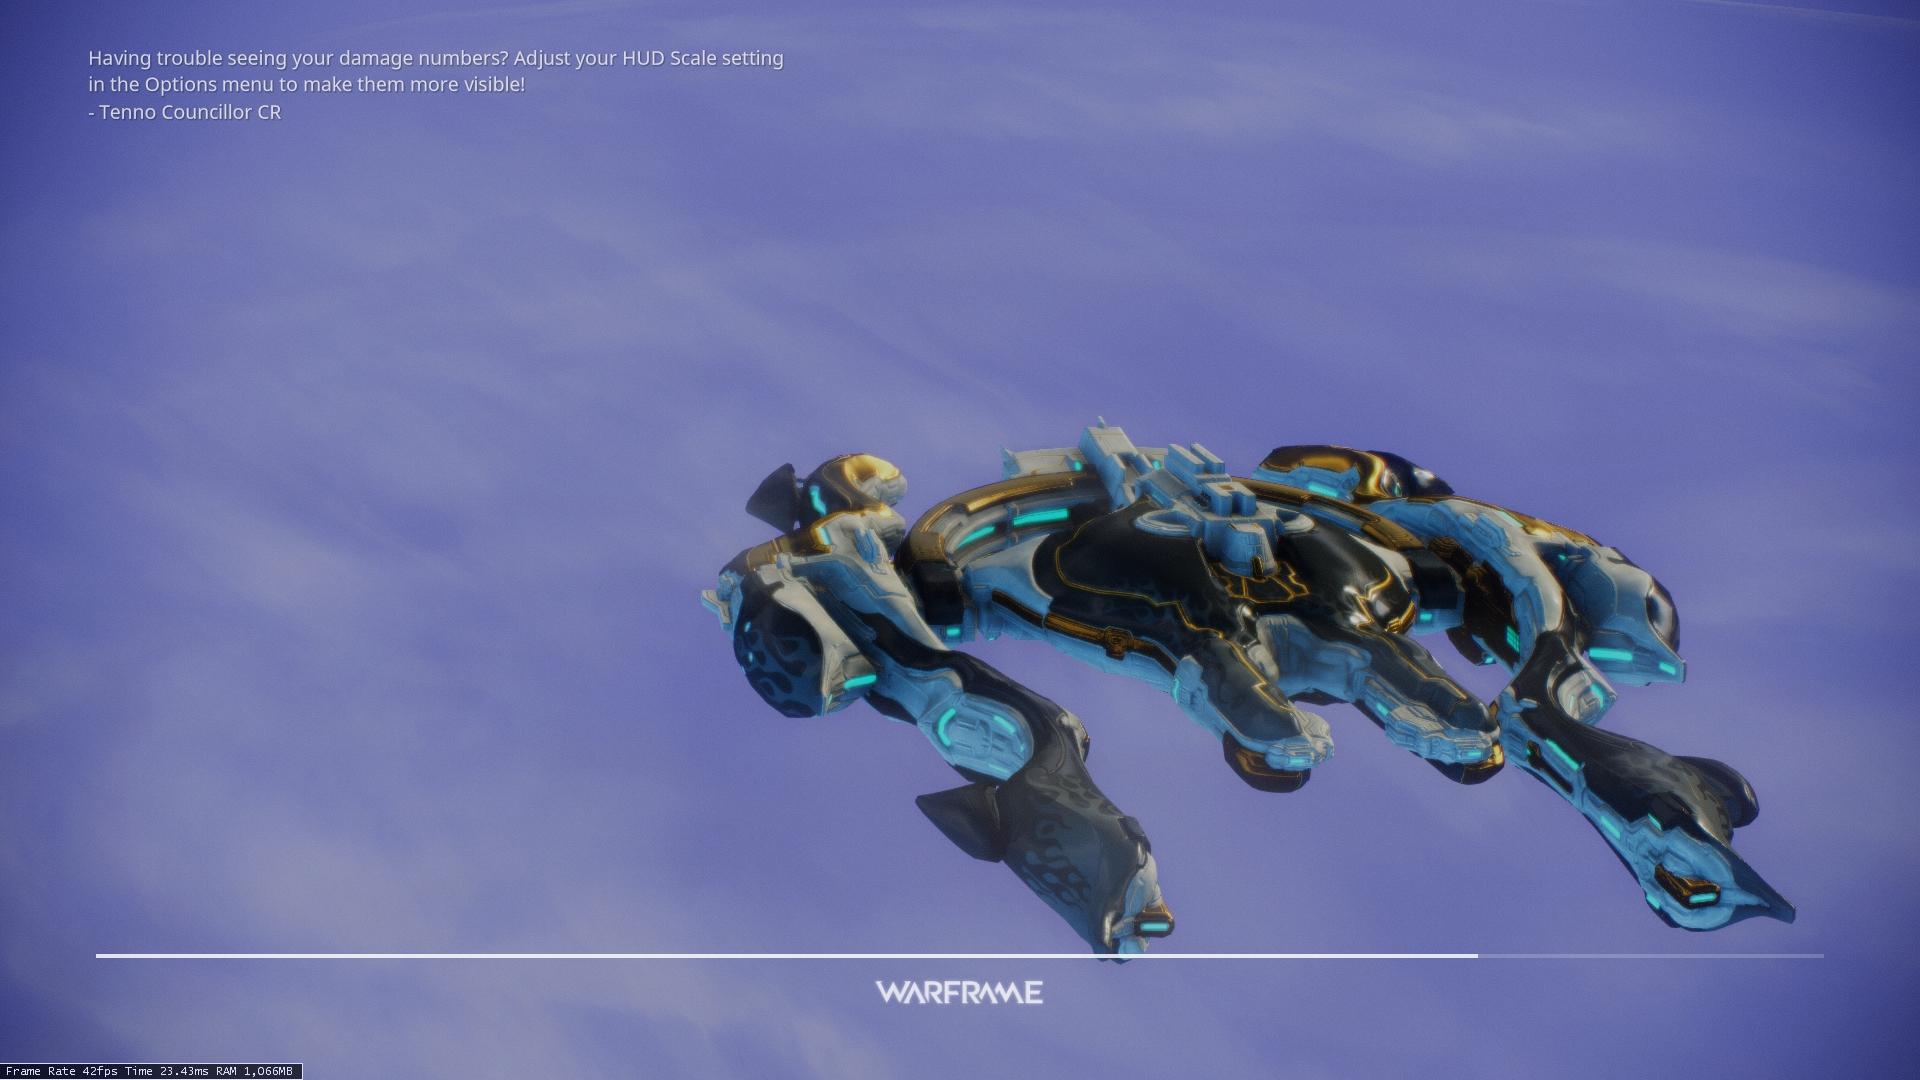 Warframe0264.jpg